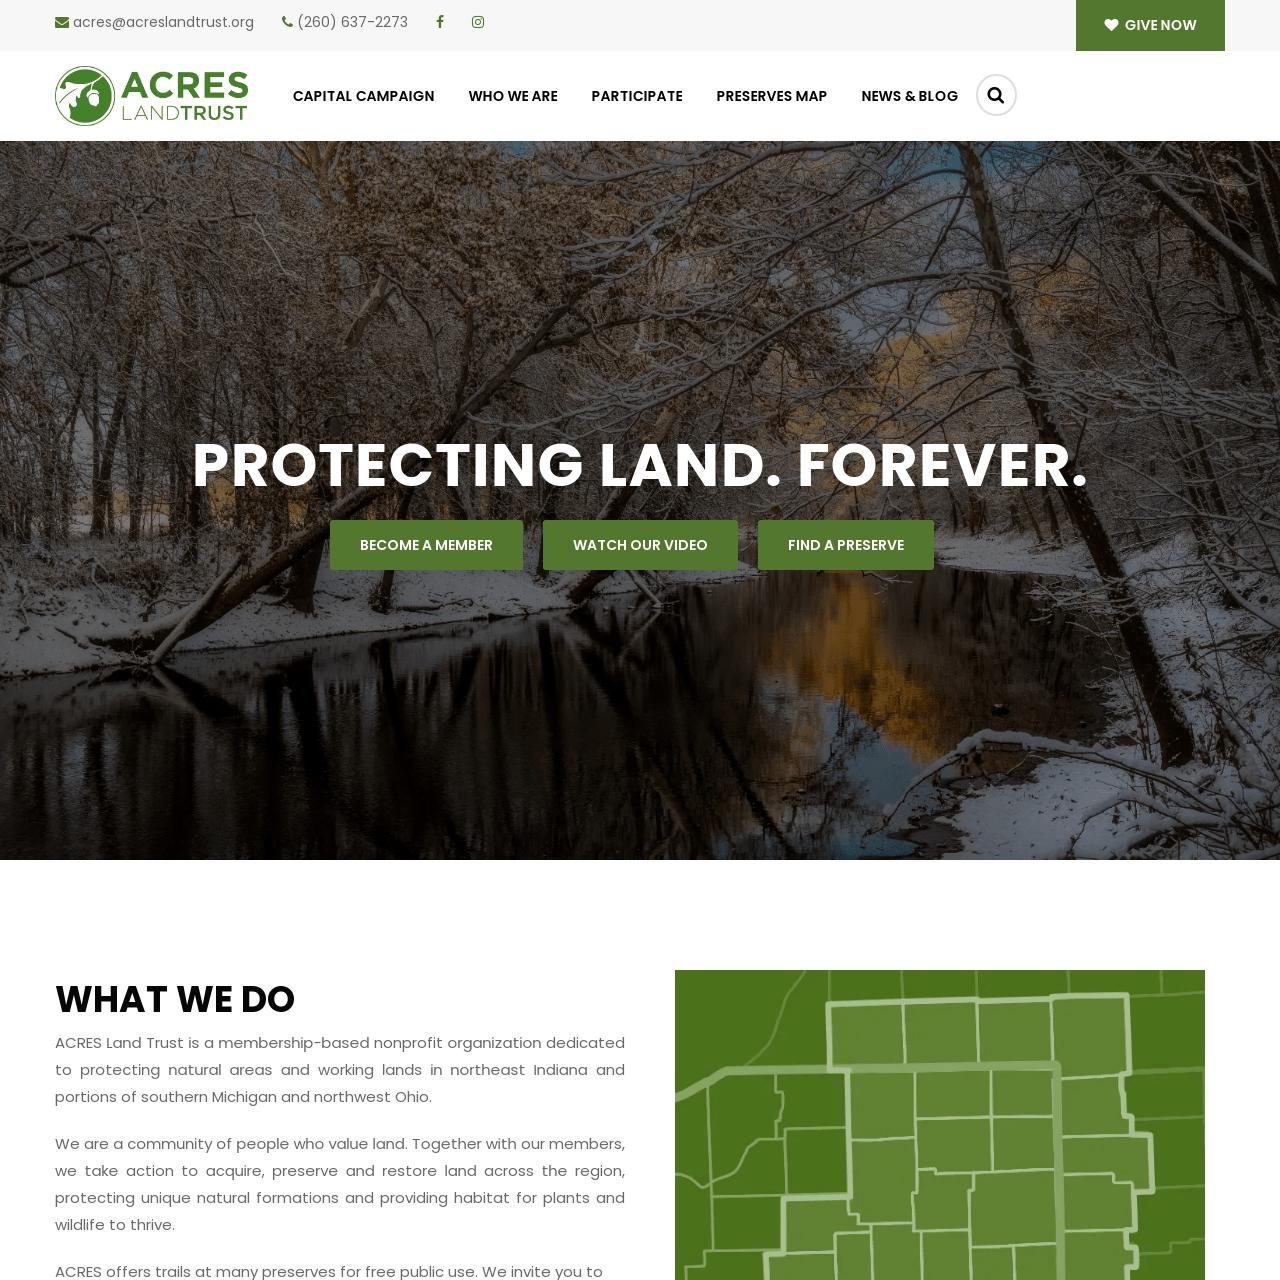 Acres Land Trust Screenshot